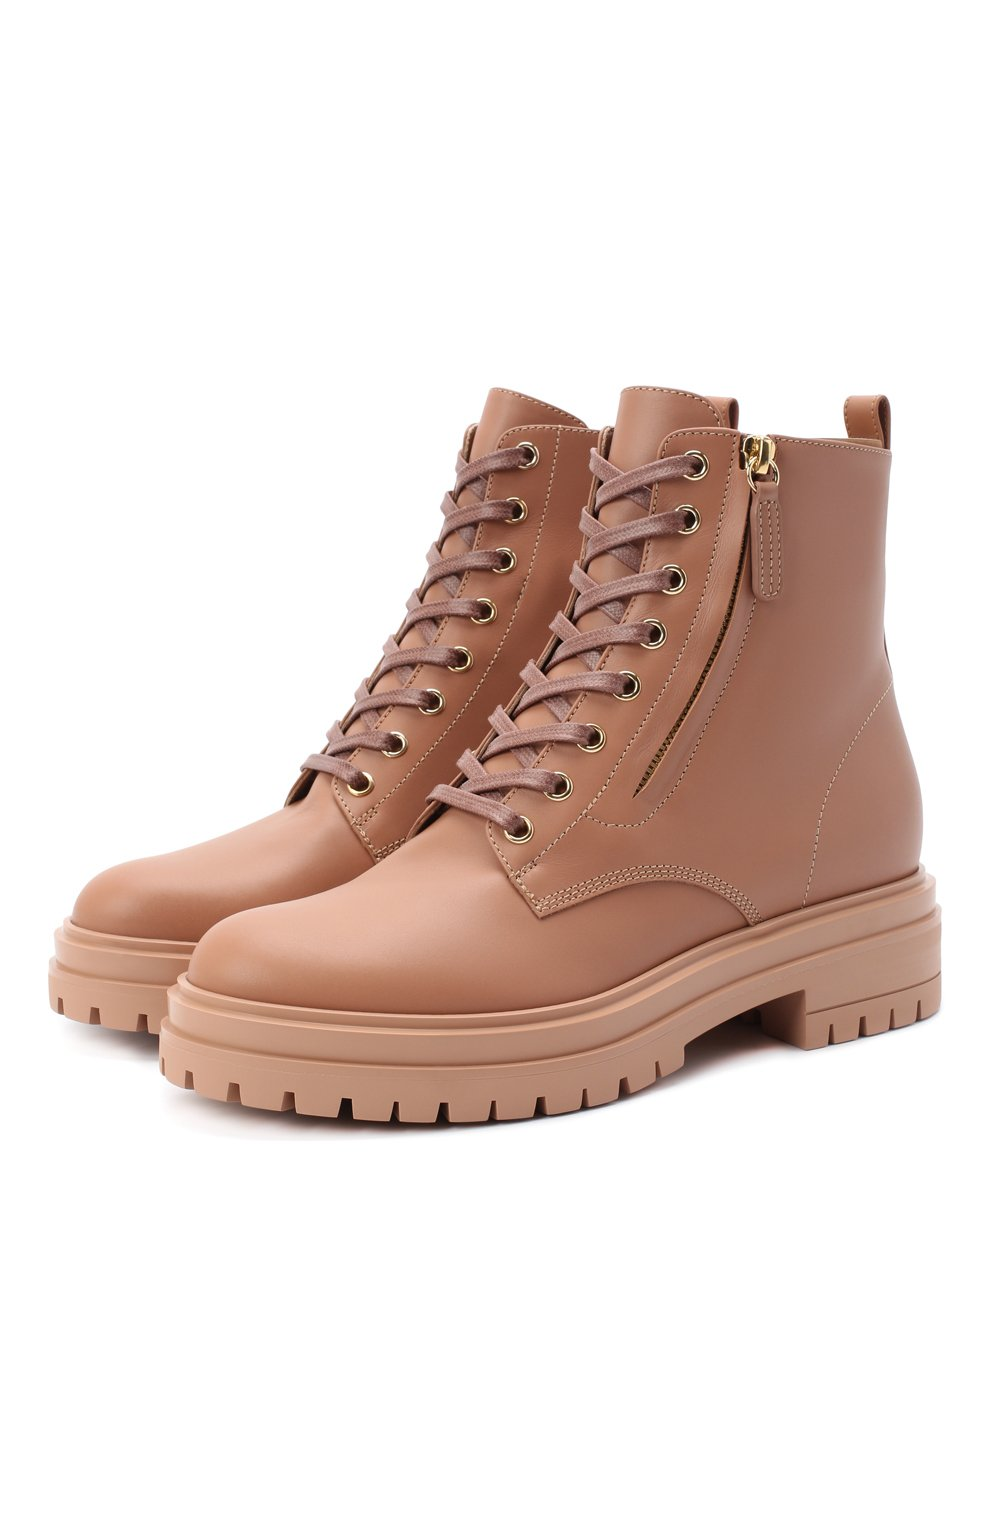 Женские кожаные ботинки turon GIANVITO ROSSI бежевого цвета, арт. G73432.20G0M.CLNPRAL | Фото 1